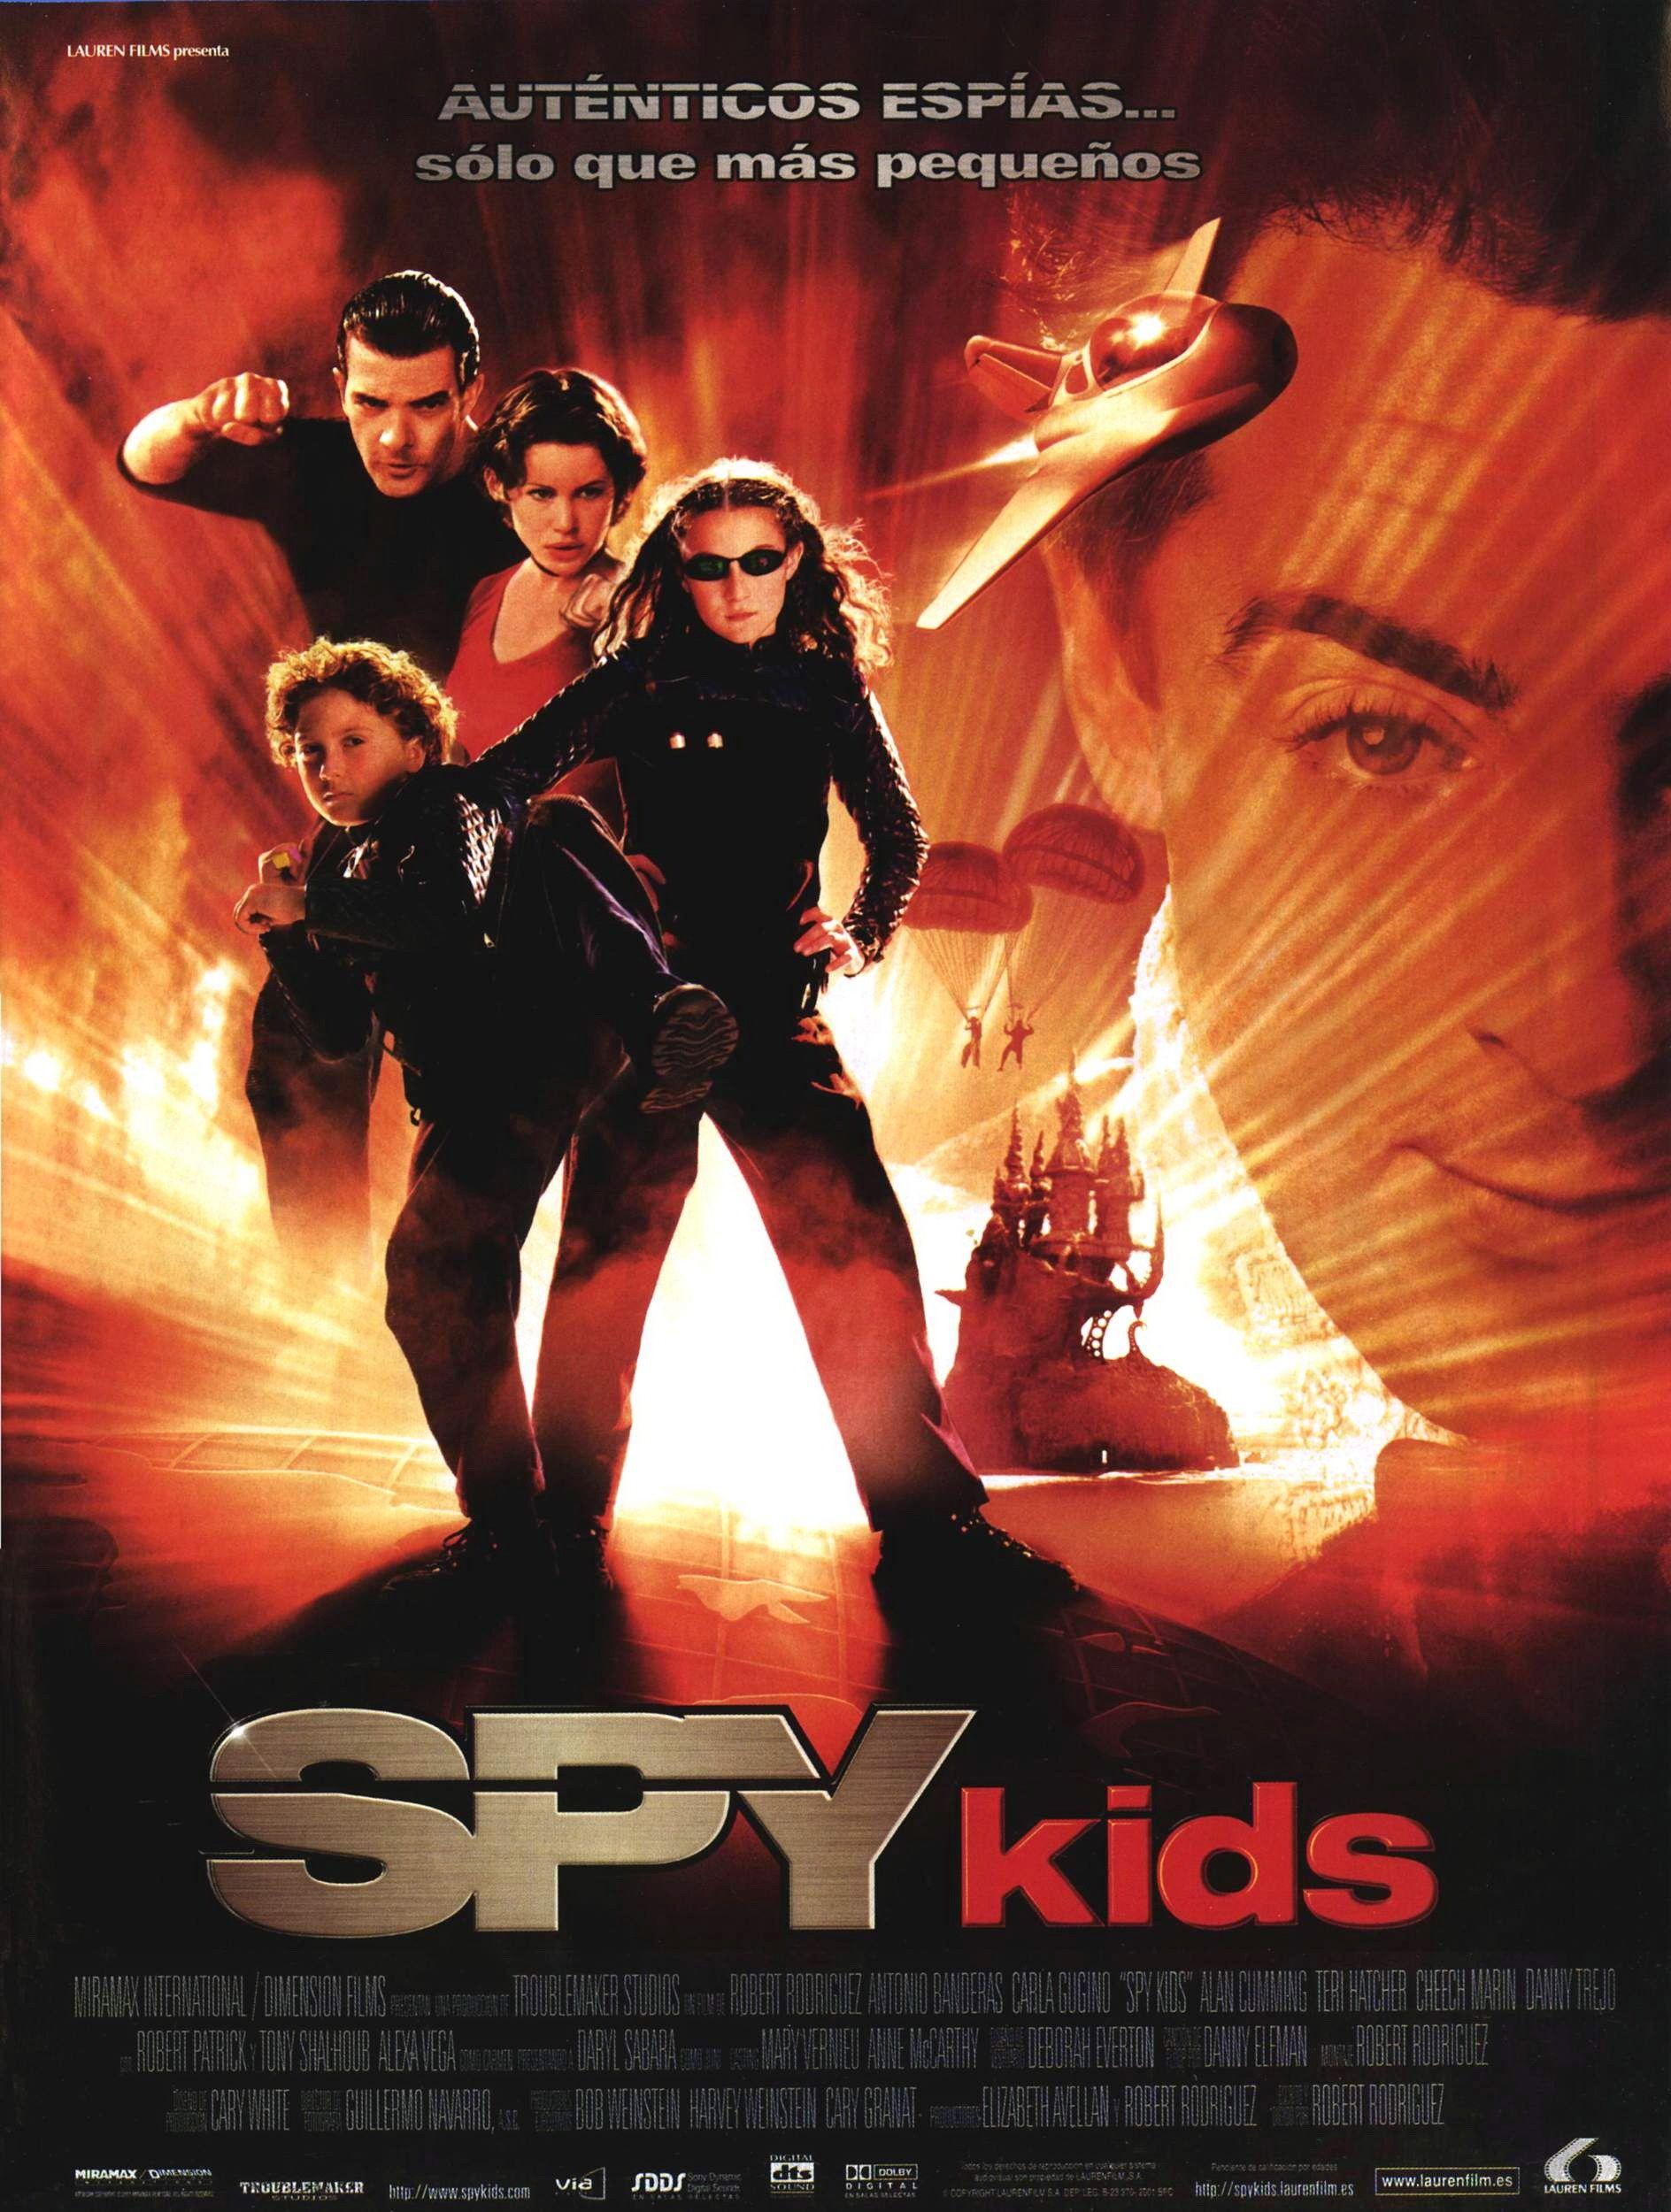 Spy Kids Spy Kids Peliculas De Pixar Peliculas Familiares